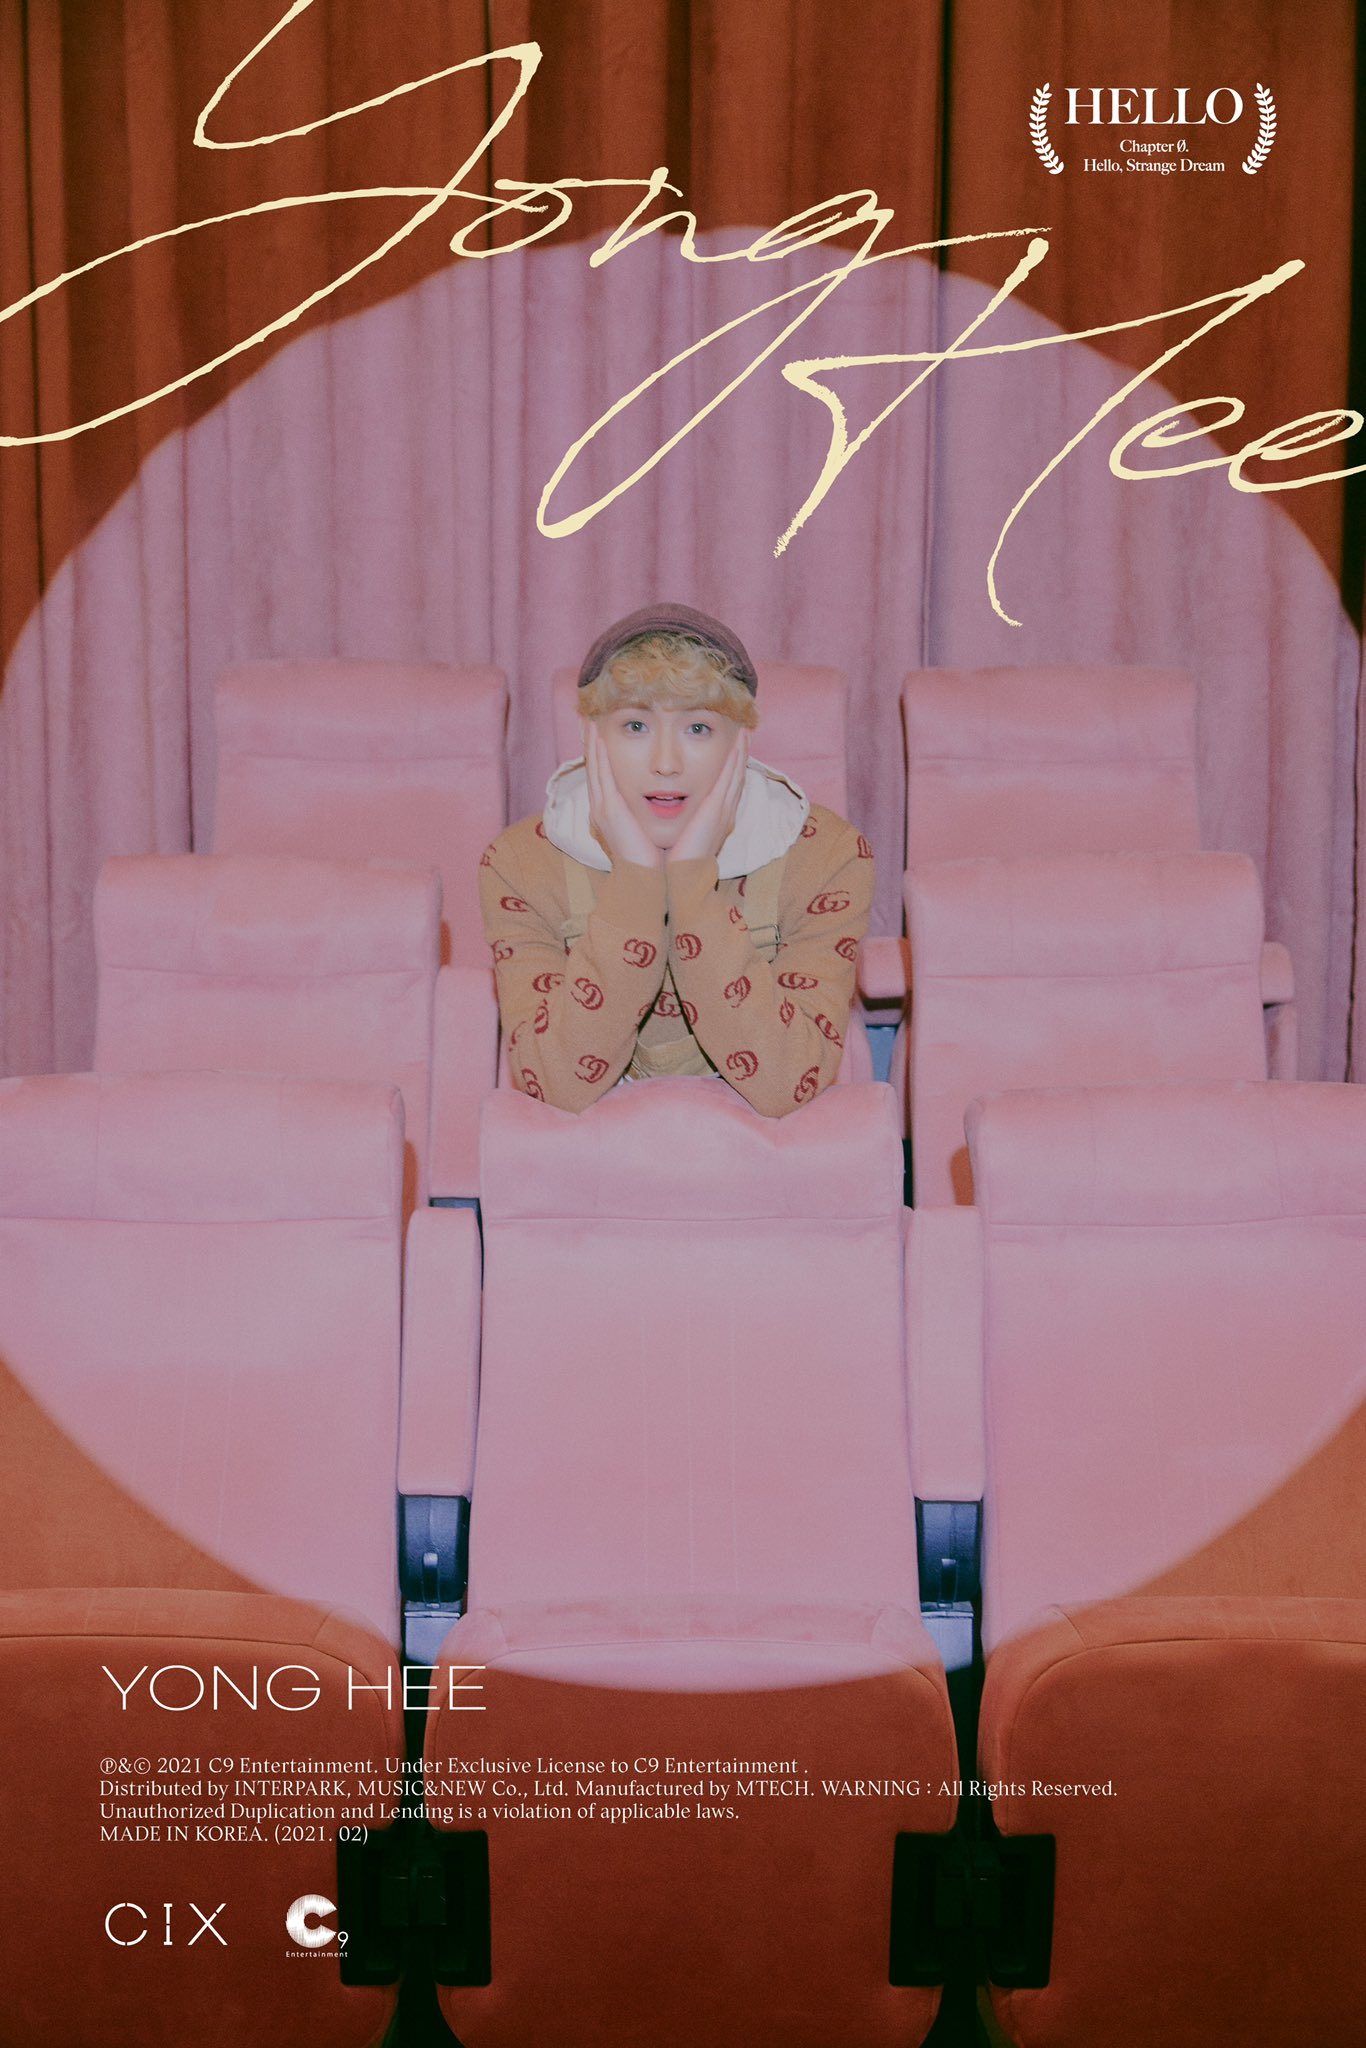 yonghee